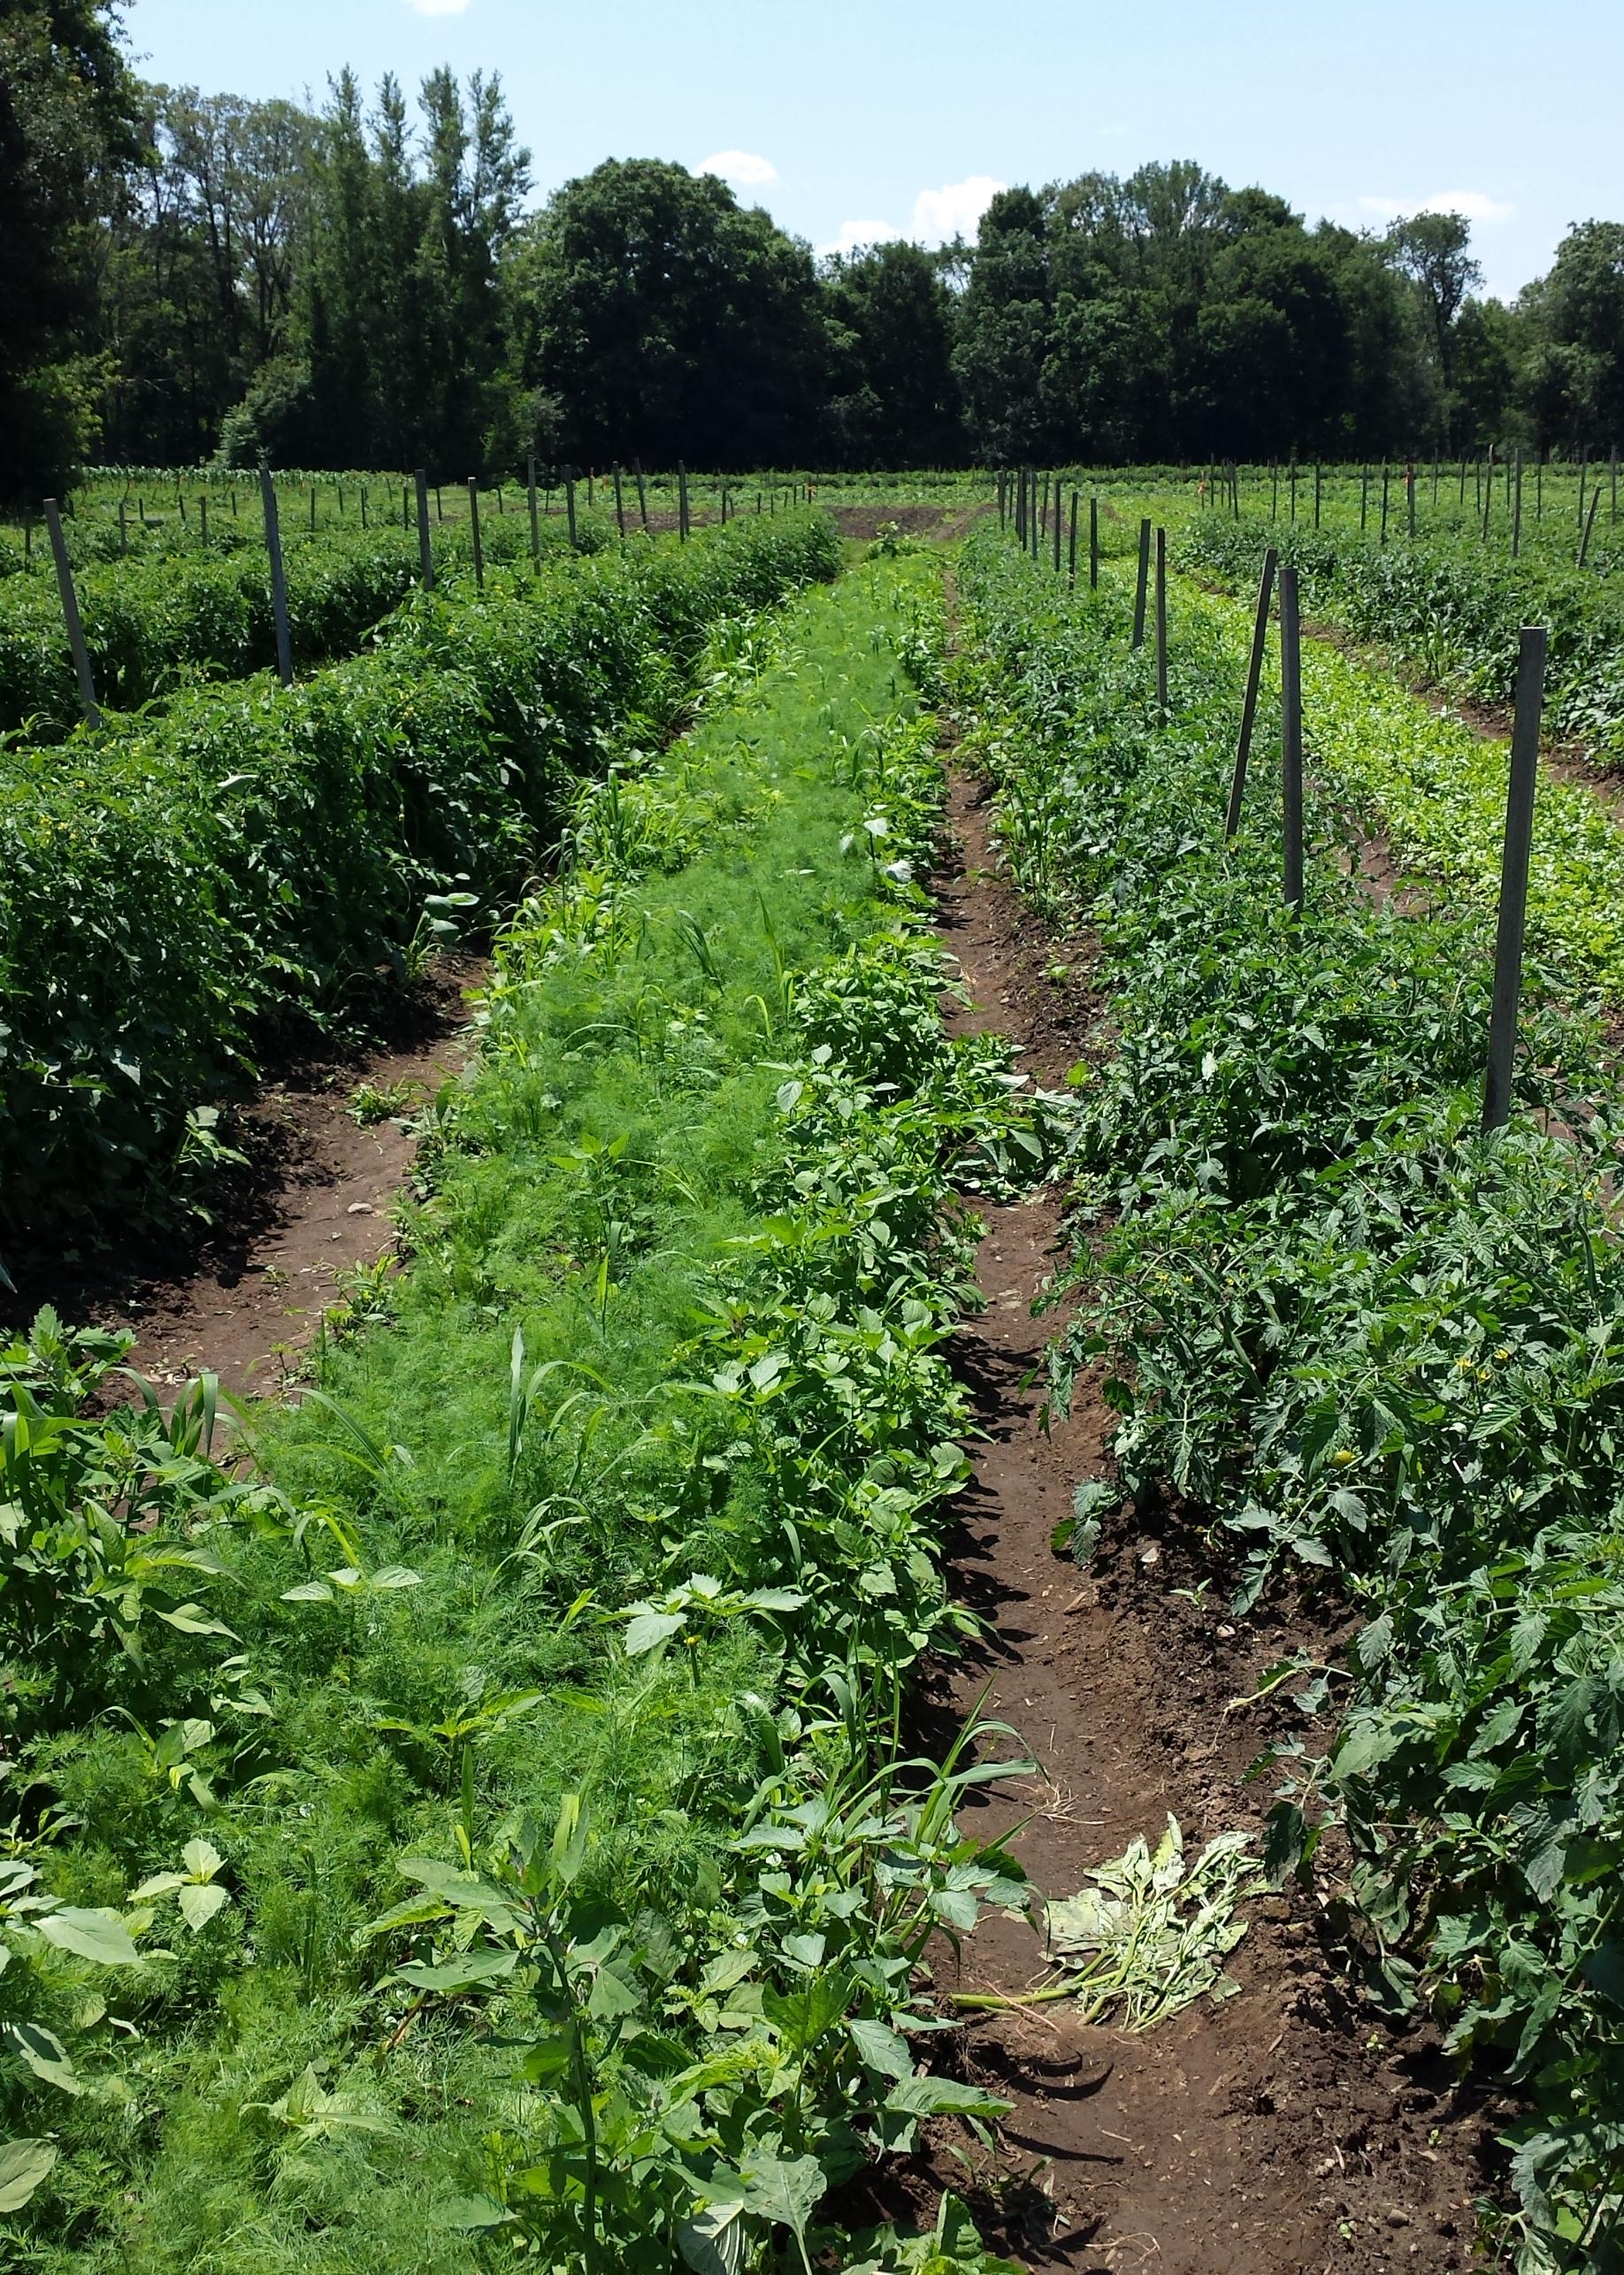 Growing food on an organic farm